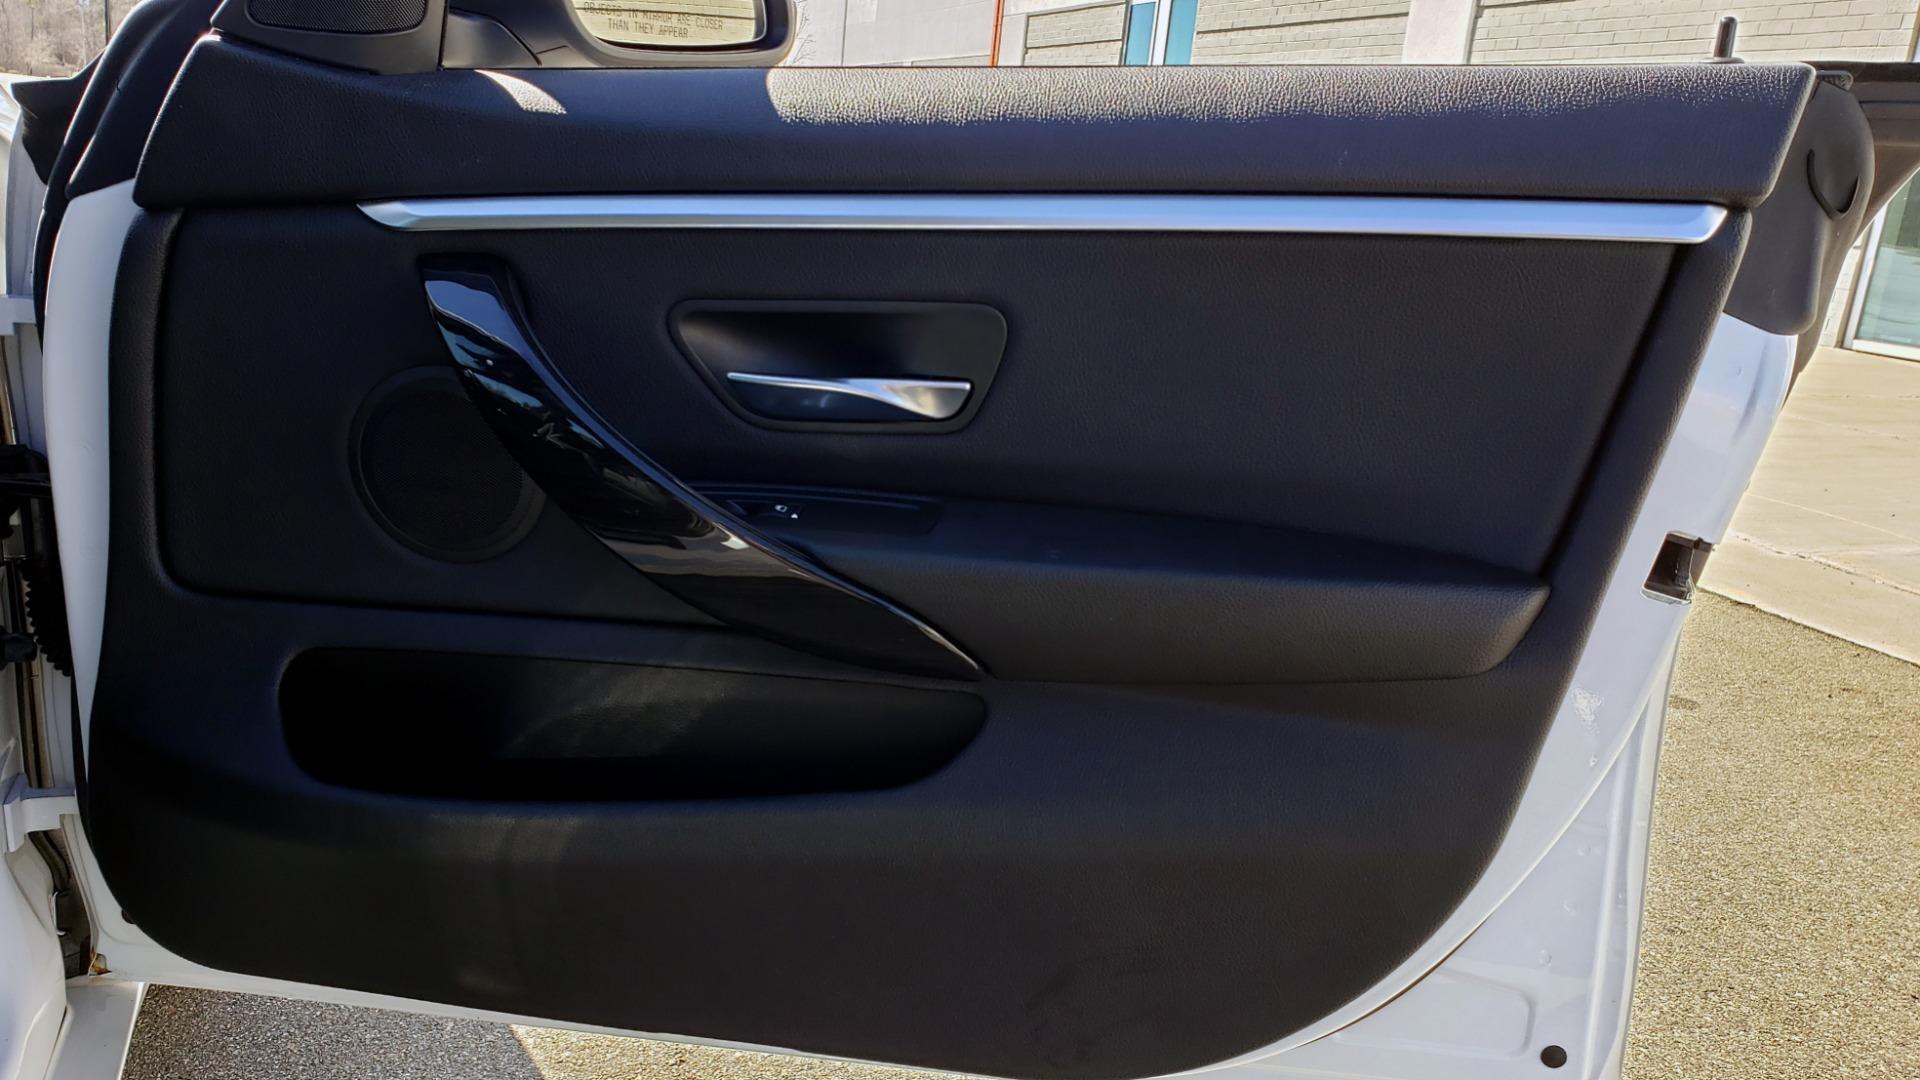 Used 2018 BMW 4 SERIES 430IXDRIVE / PREMIUM / NAV / SUNROOF / ESSENTIALS PKG for sale $27,795 at Formula Imports in Charlotte NC 28227 67